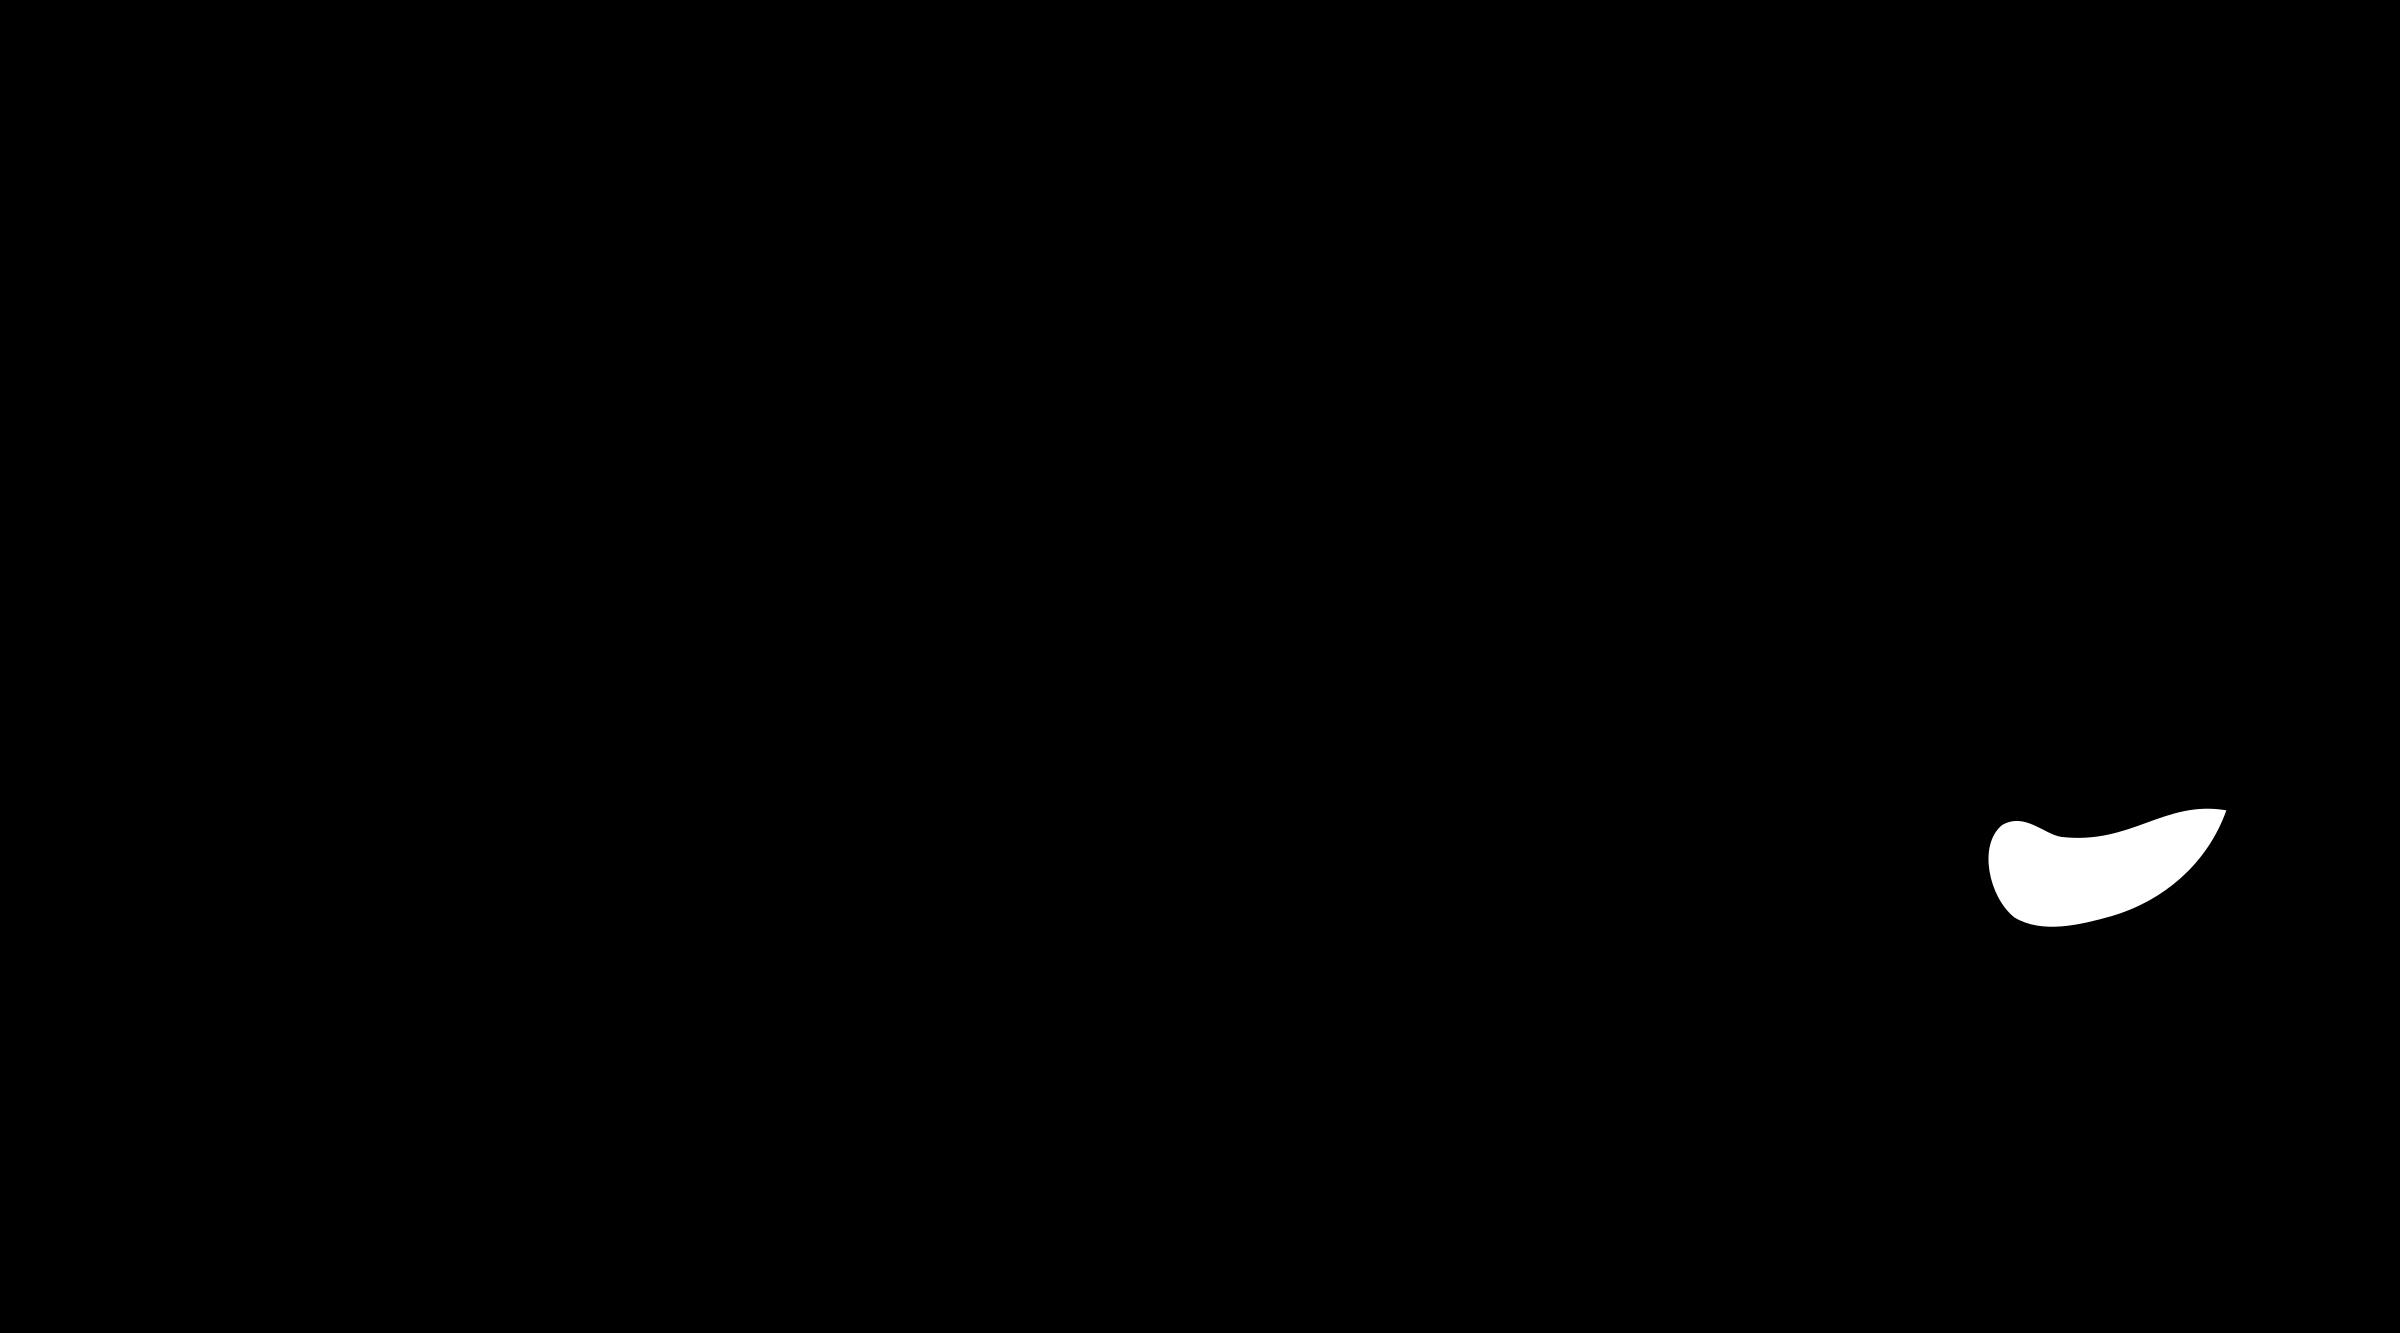 Bison clipart black and white Icon Black Clipart Bison White